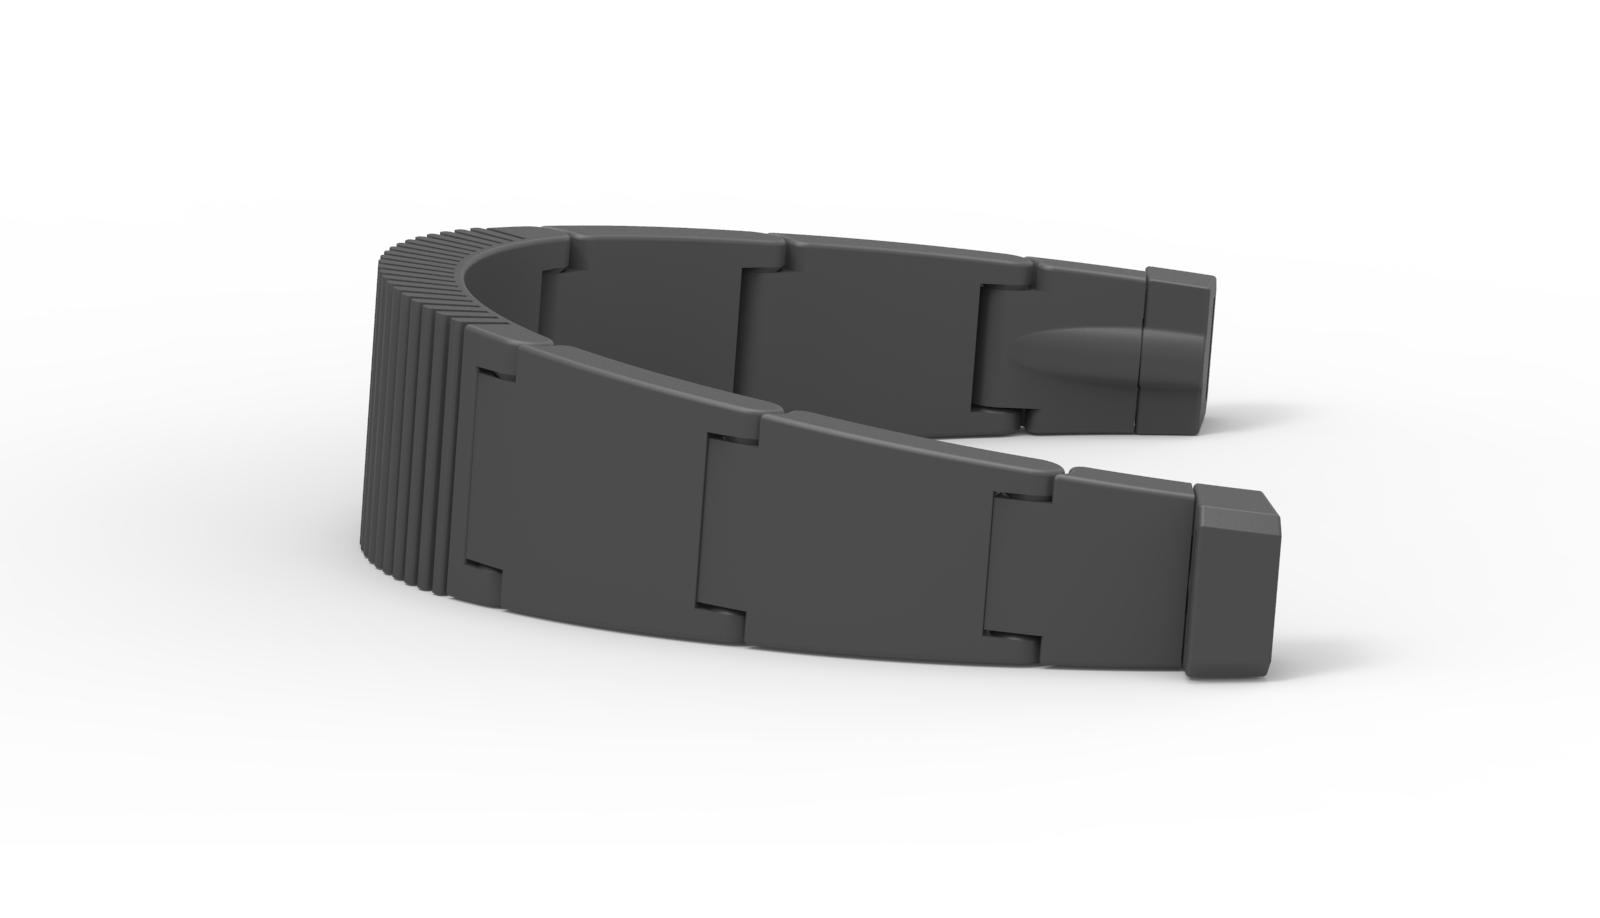 3D printable headband